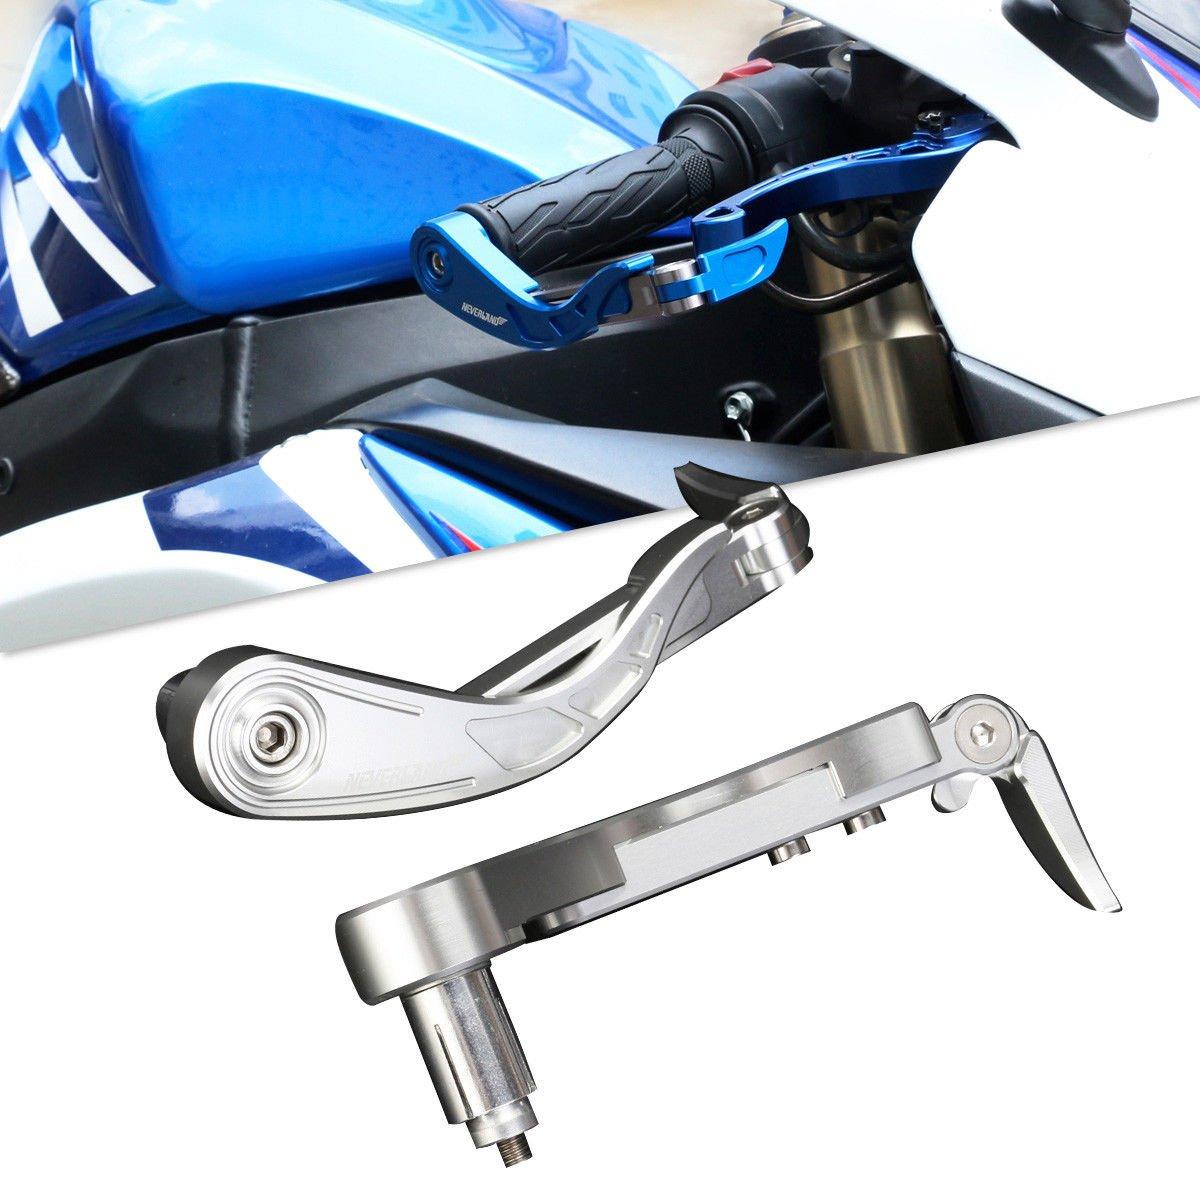 NOVSIGHT 7/8' 22mm Motorrad Hebelschü tzer Lenkerenden Handschü tzer Handguard Griffe Fü r Yamaha Suzuki Honda Triumph Kawasaki Blau - A Design